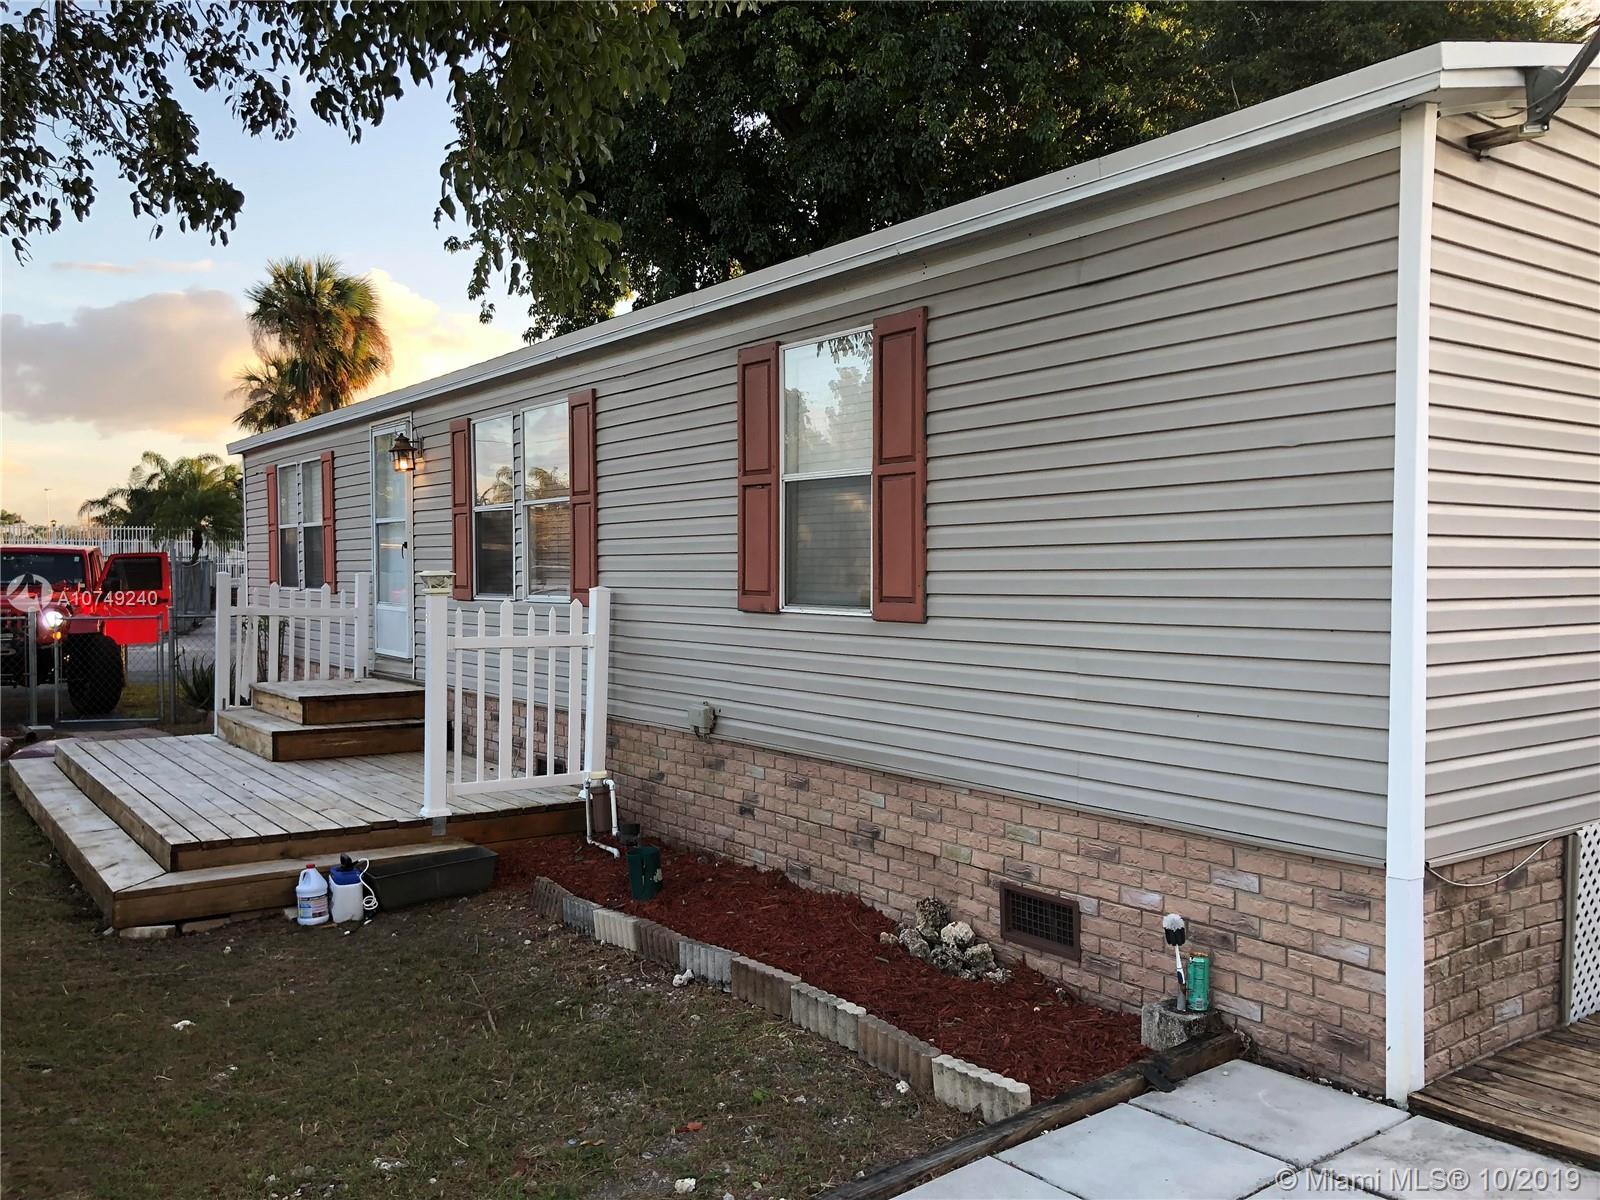 220 NE 12th Ave Lot 75, Homestead, FL 33030 - Homestead, FL real estate listing